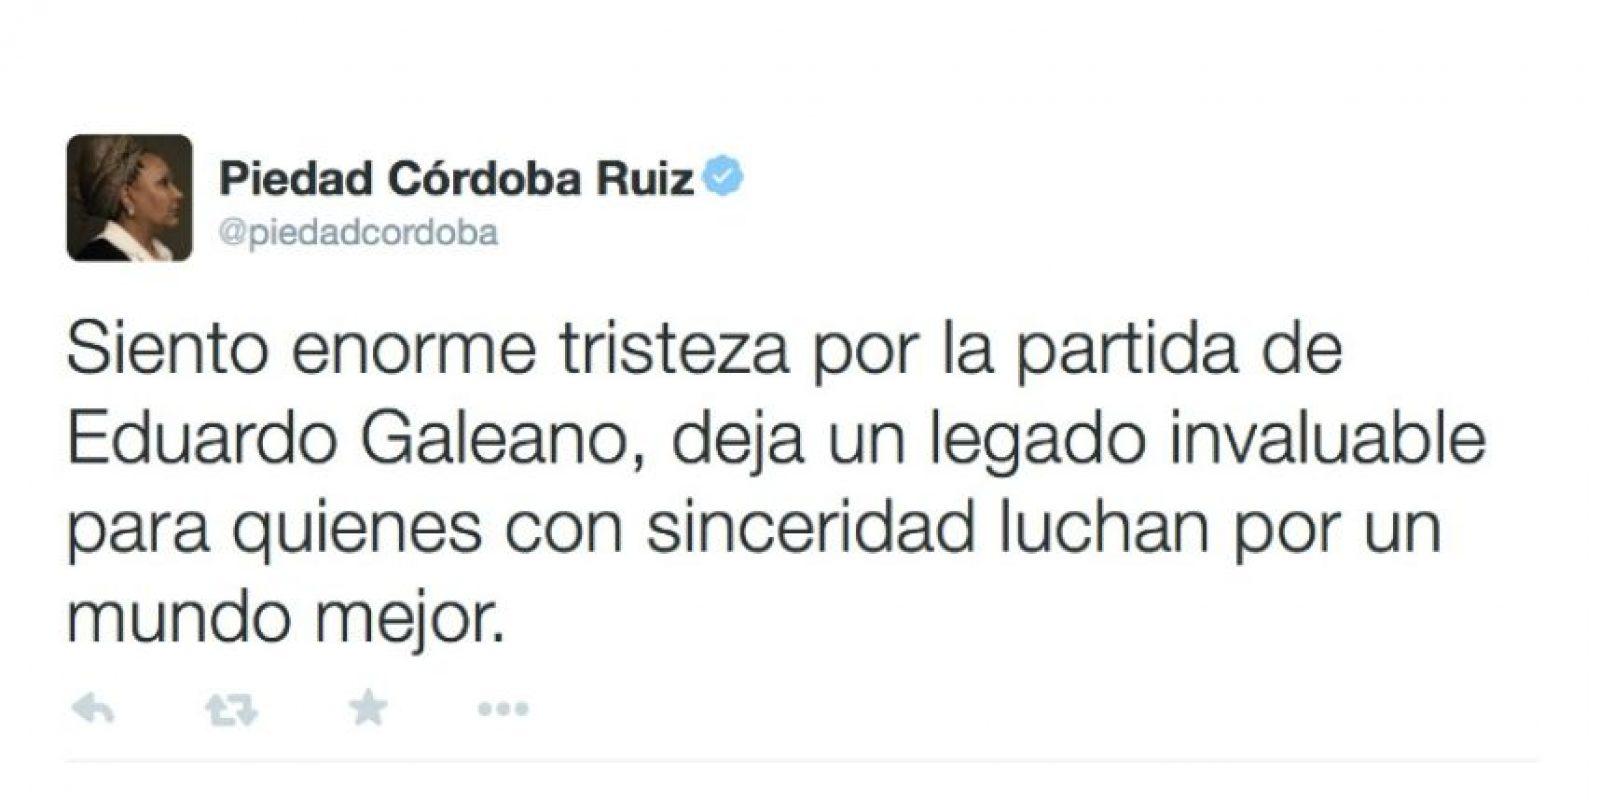 Piedad Córdoba Ruiz, exsenadora colombiana Foto:Twiiter.com/piedadcordoba